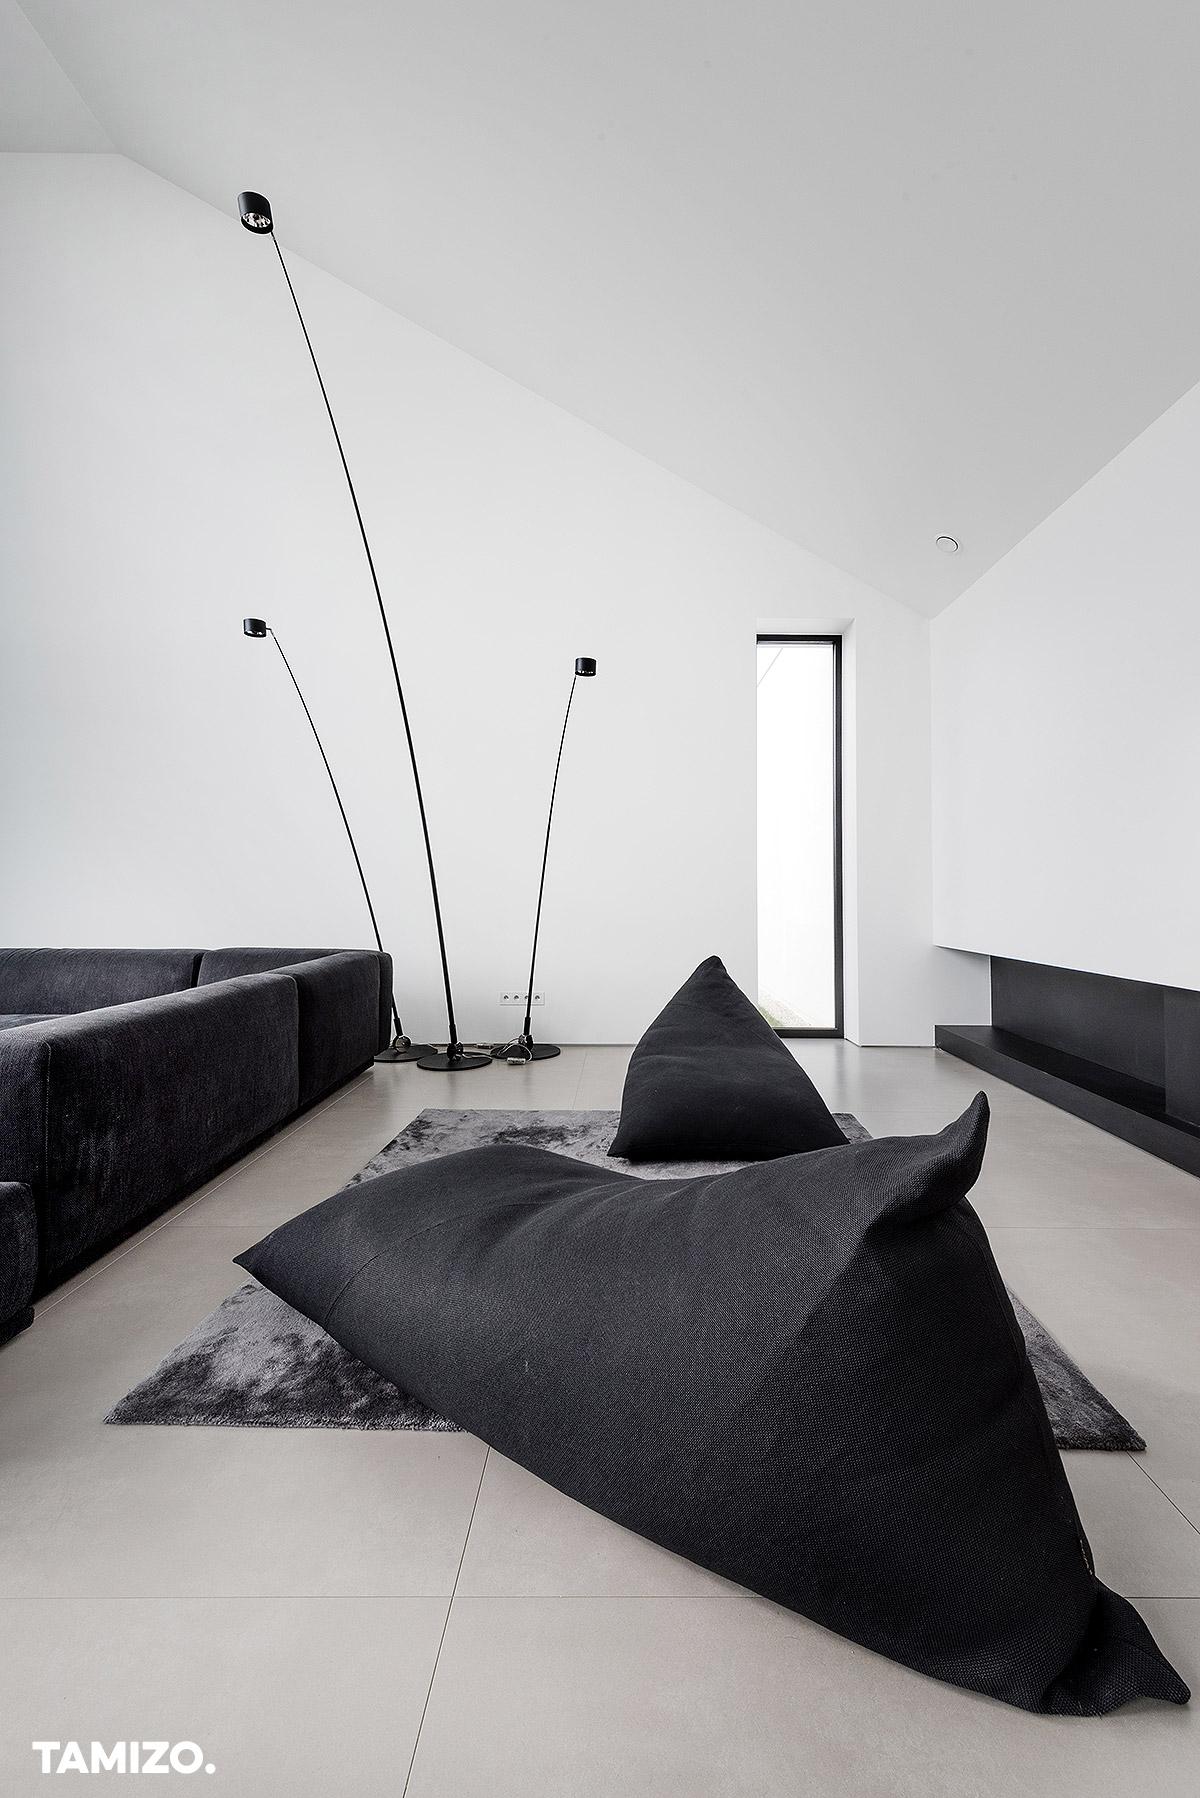 002_tamizo_architects_interior_house_realization_warsaw_poland_08